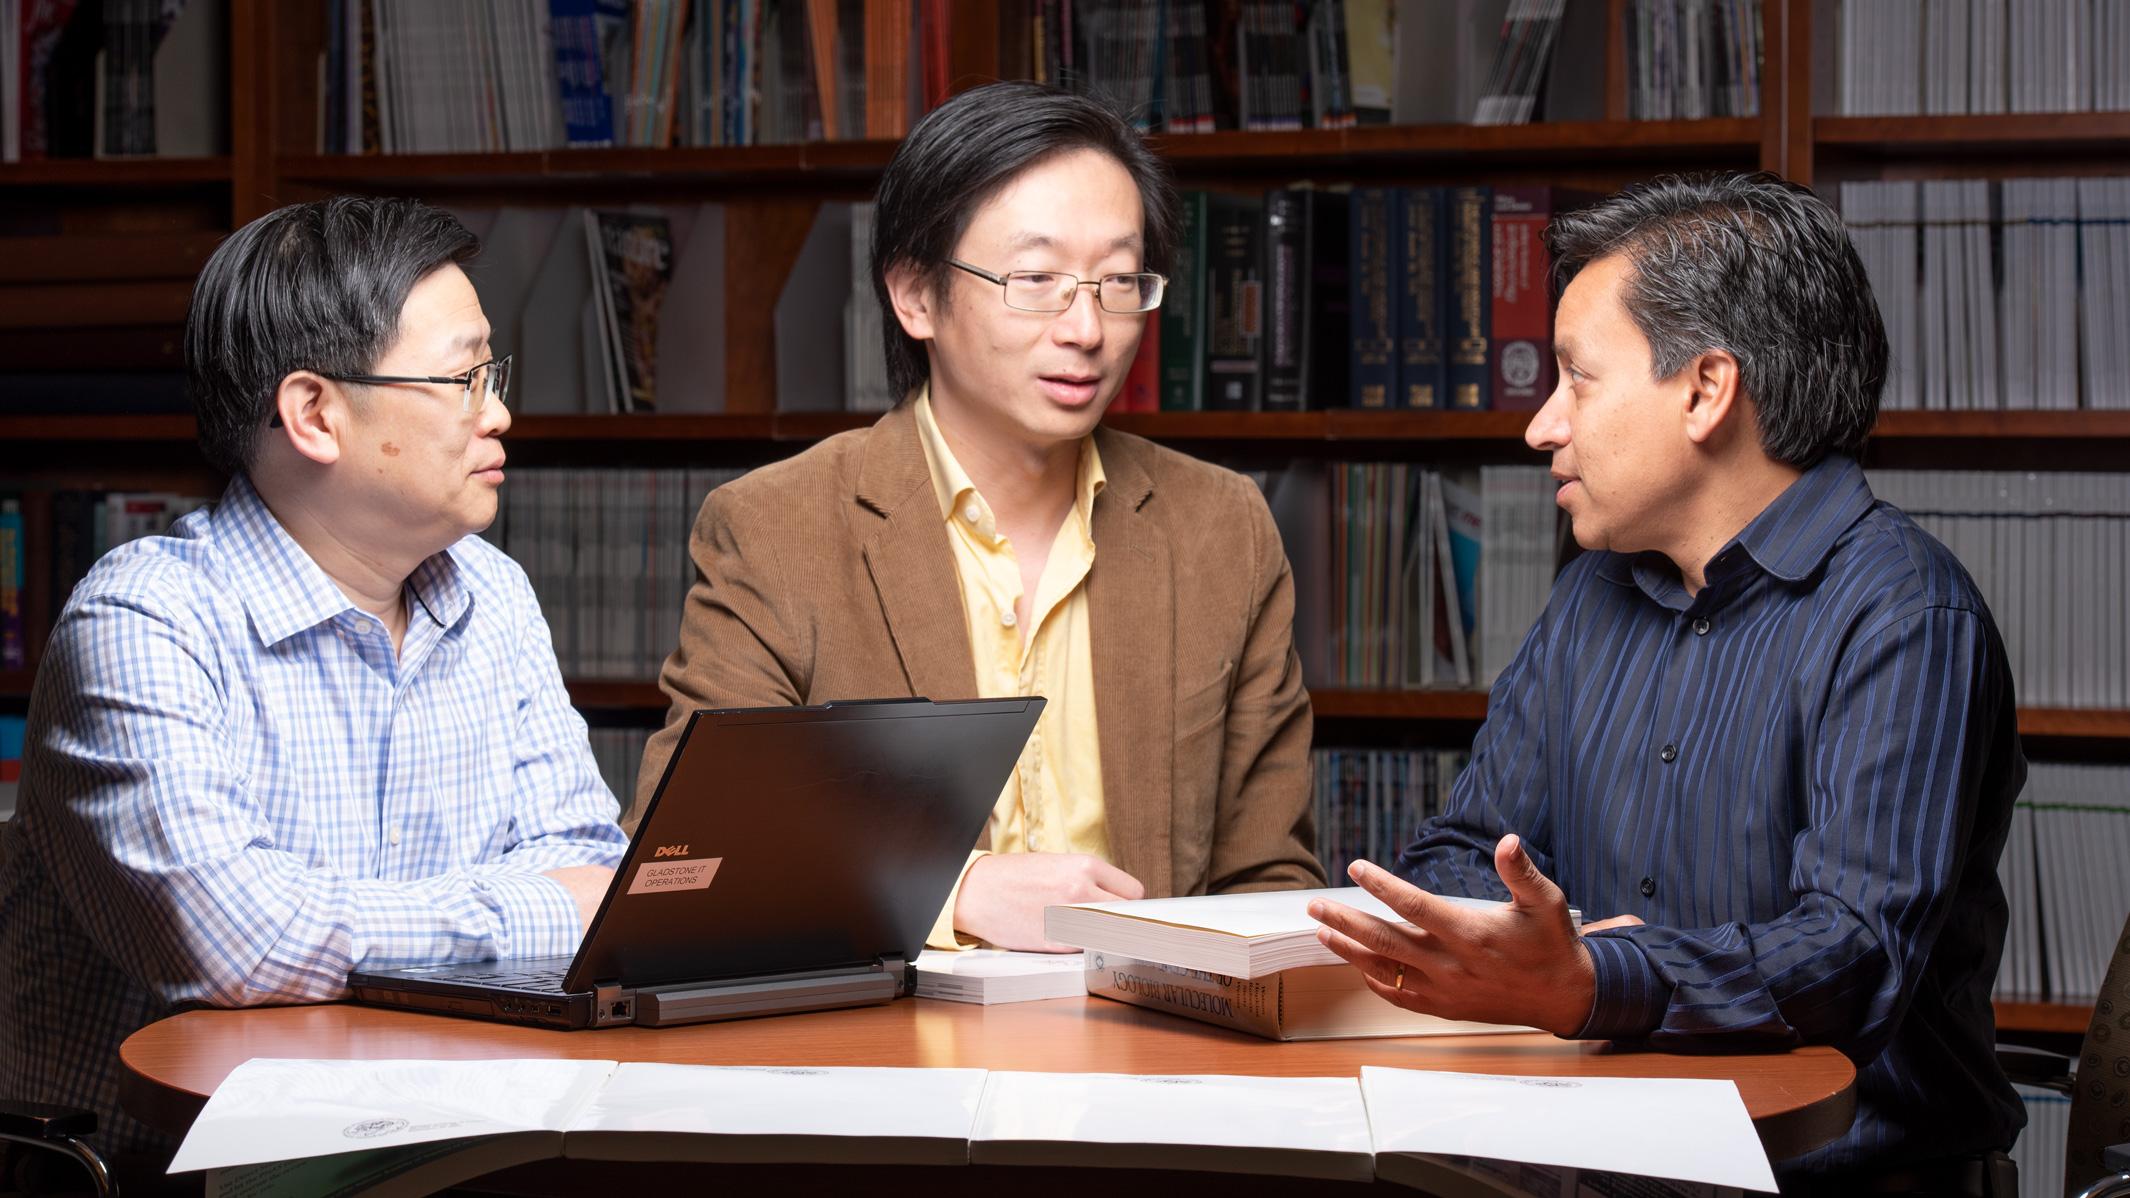 Gladstone investigators at a table speaking